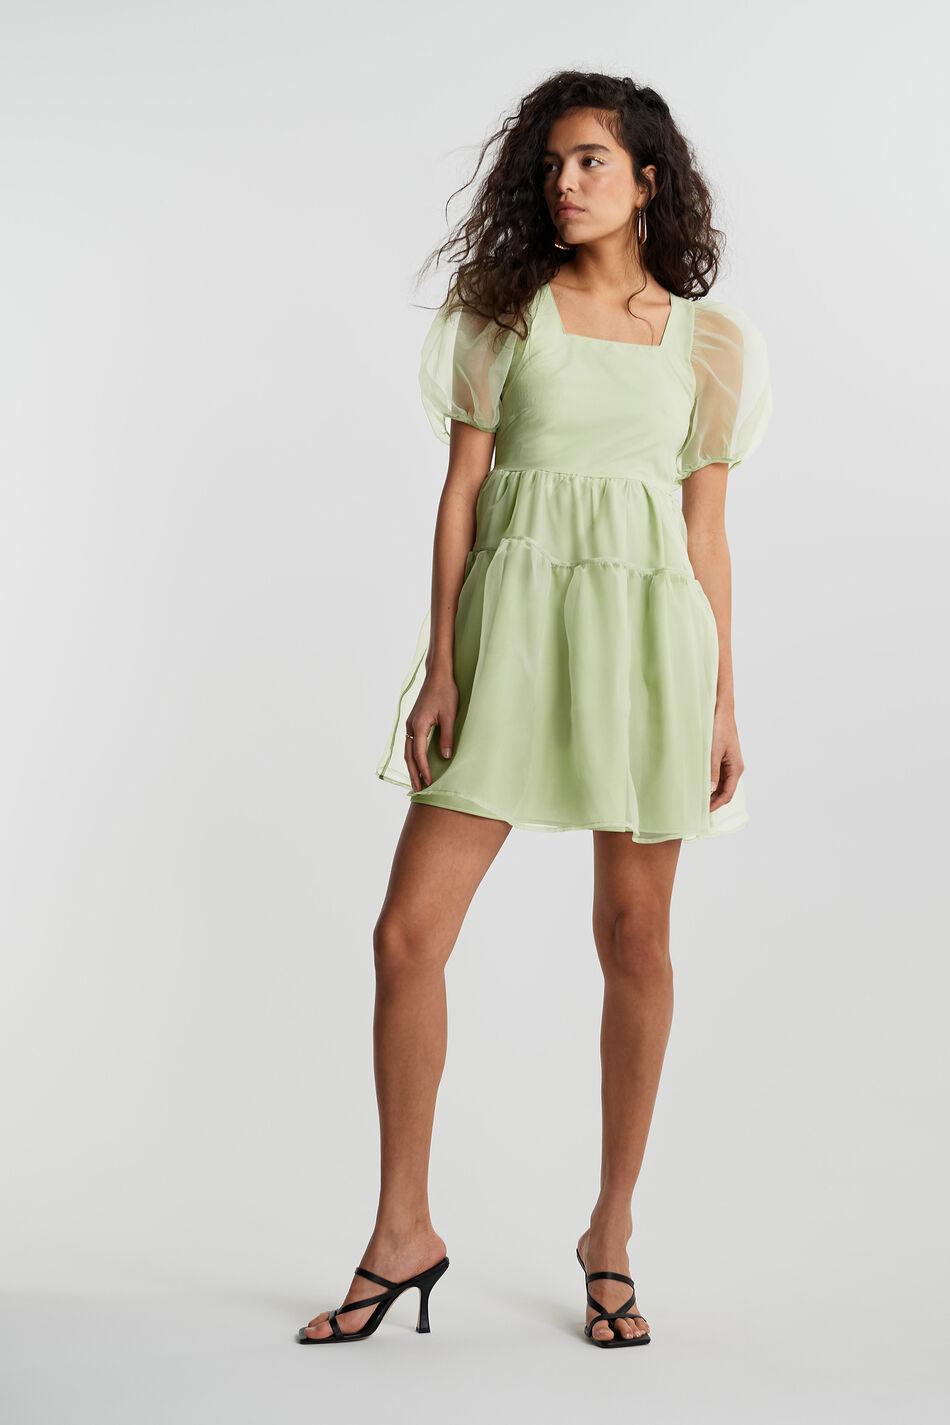 Gina Tricot Duva organza dress